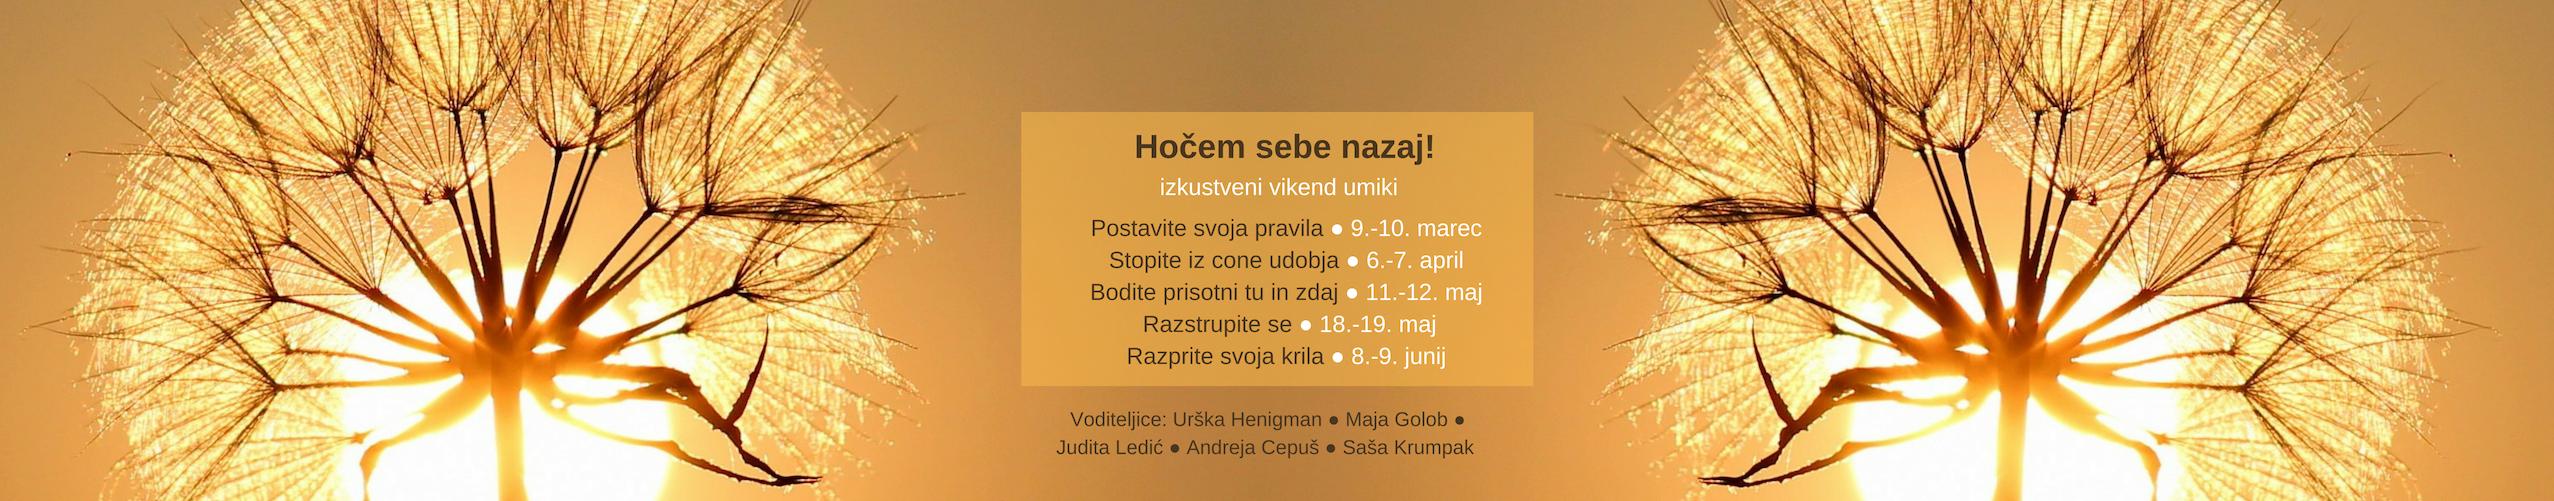 banner prva stran Ekvilibrium- HSN